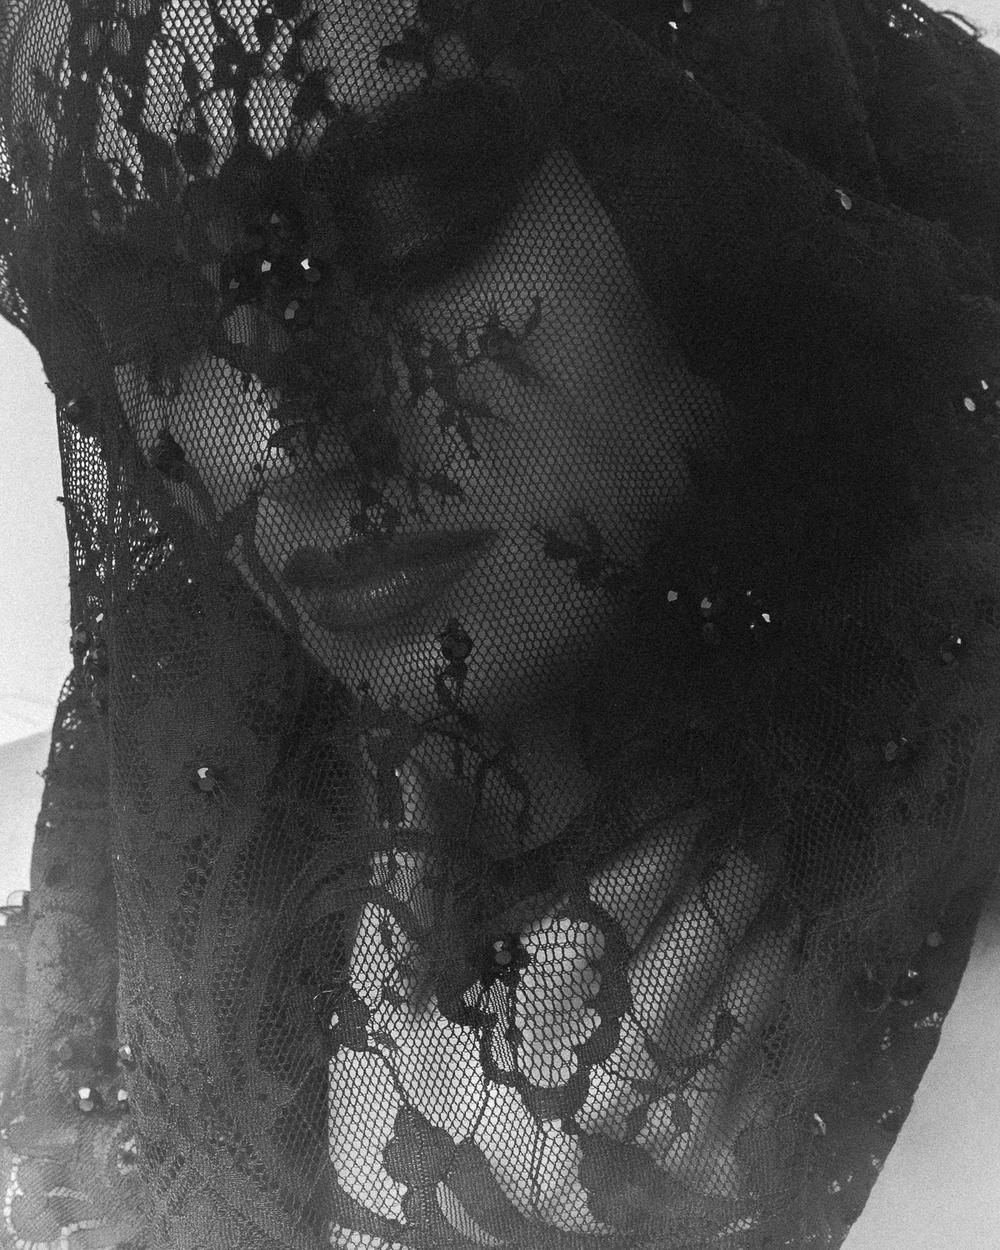 © C.J Monk